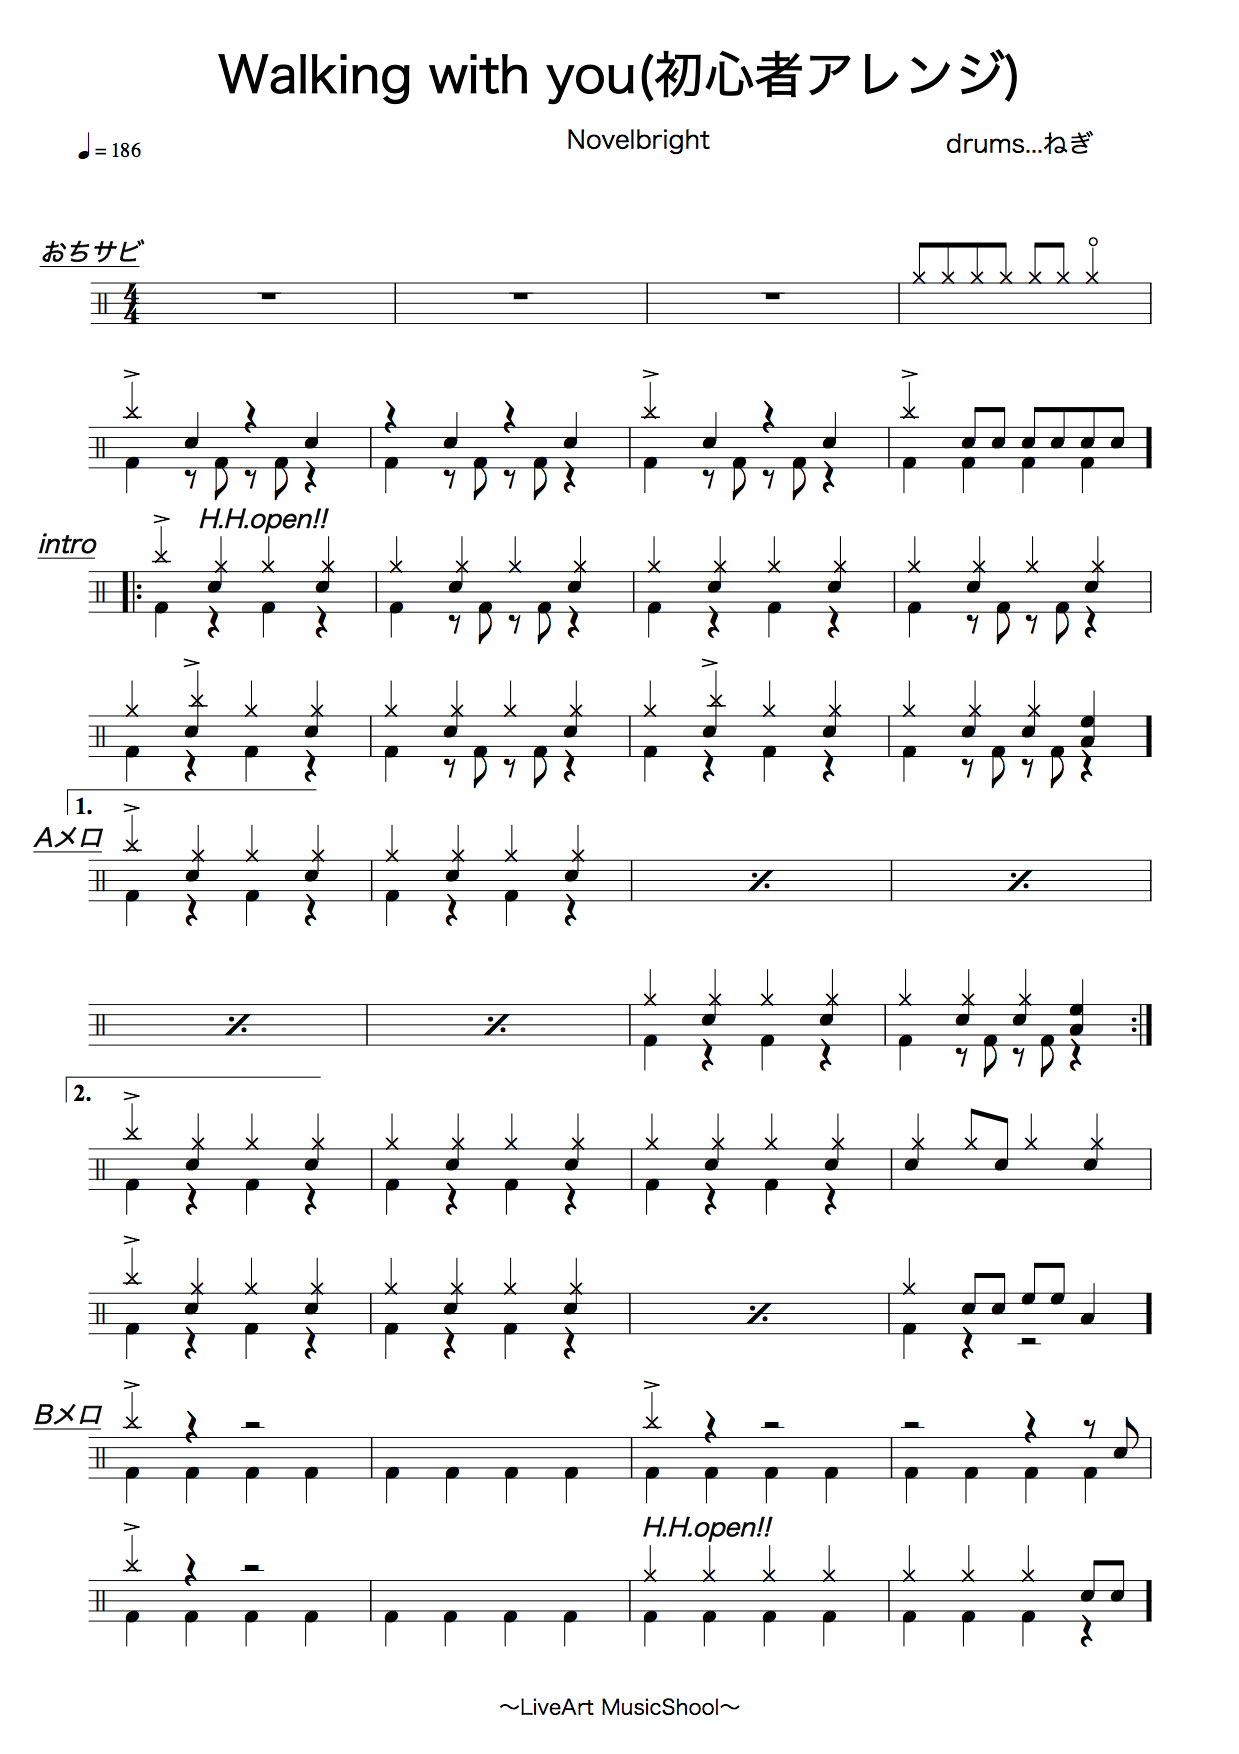 Walkingwithyou,ドラム楽譜1